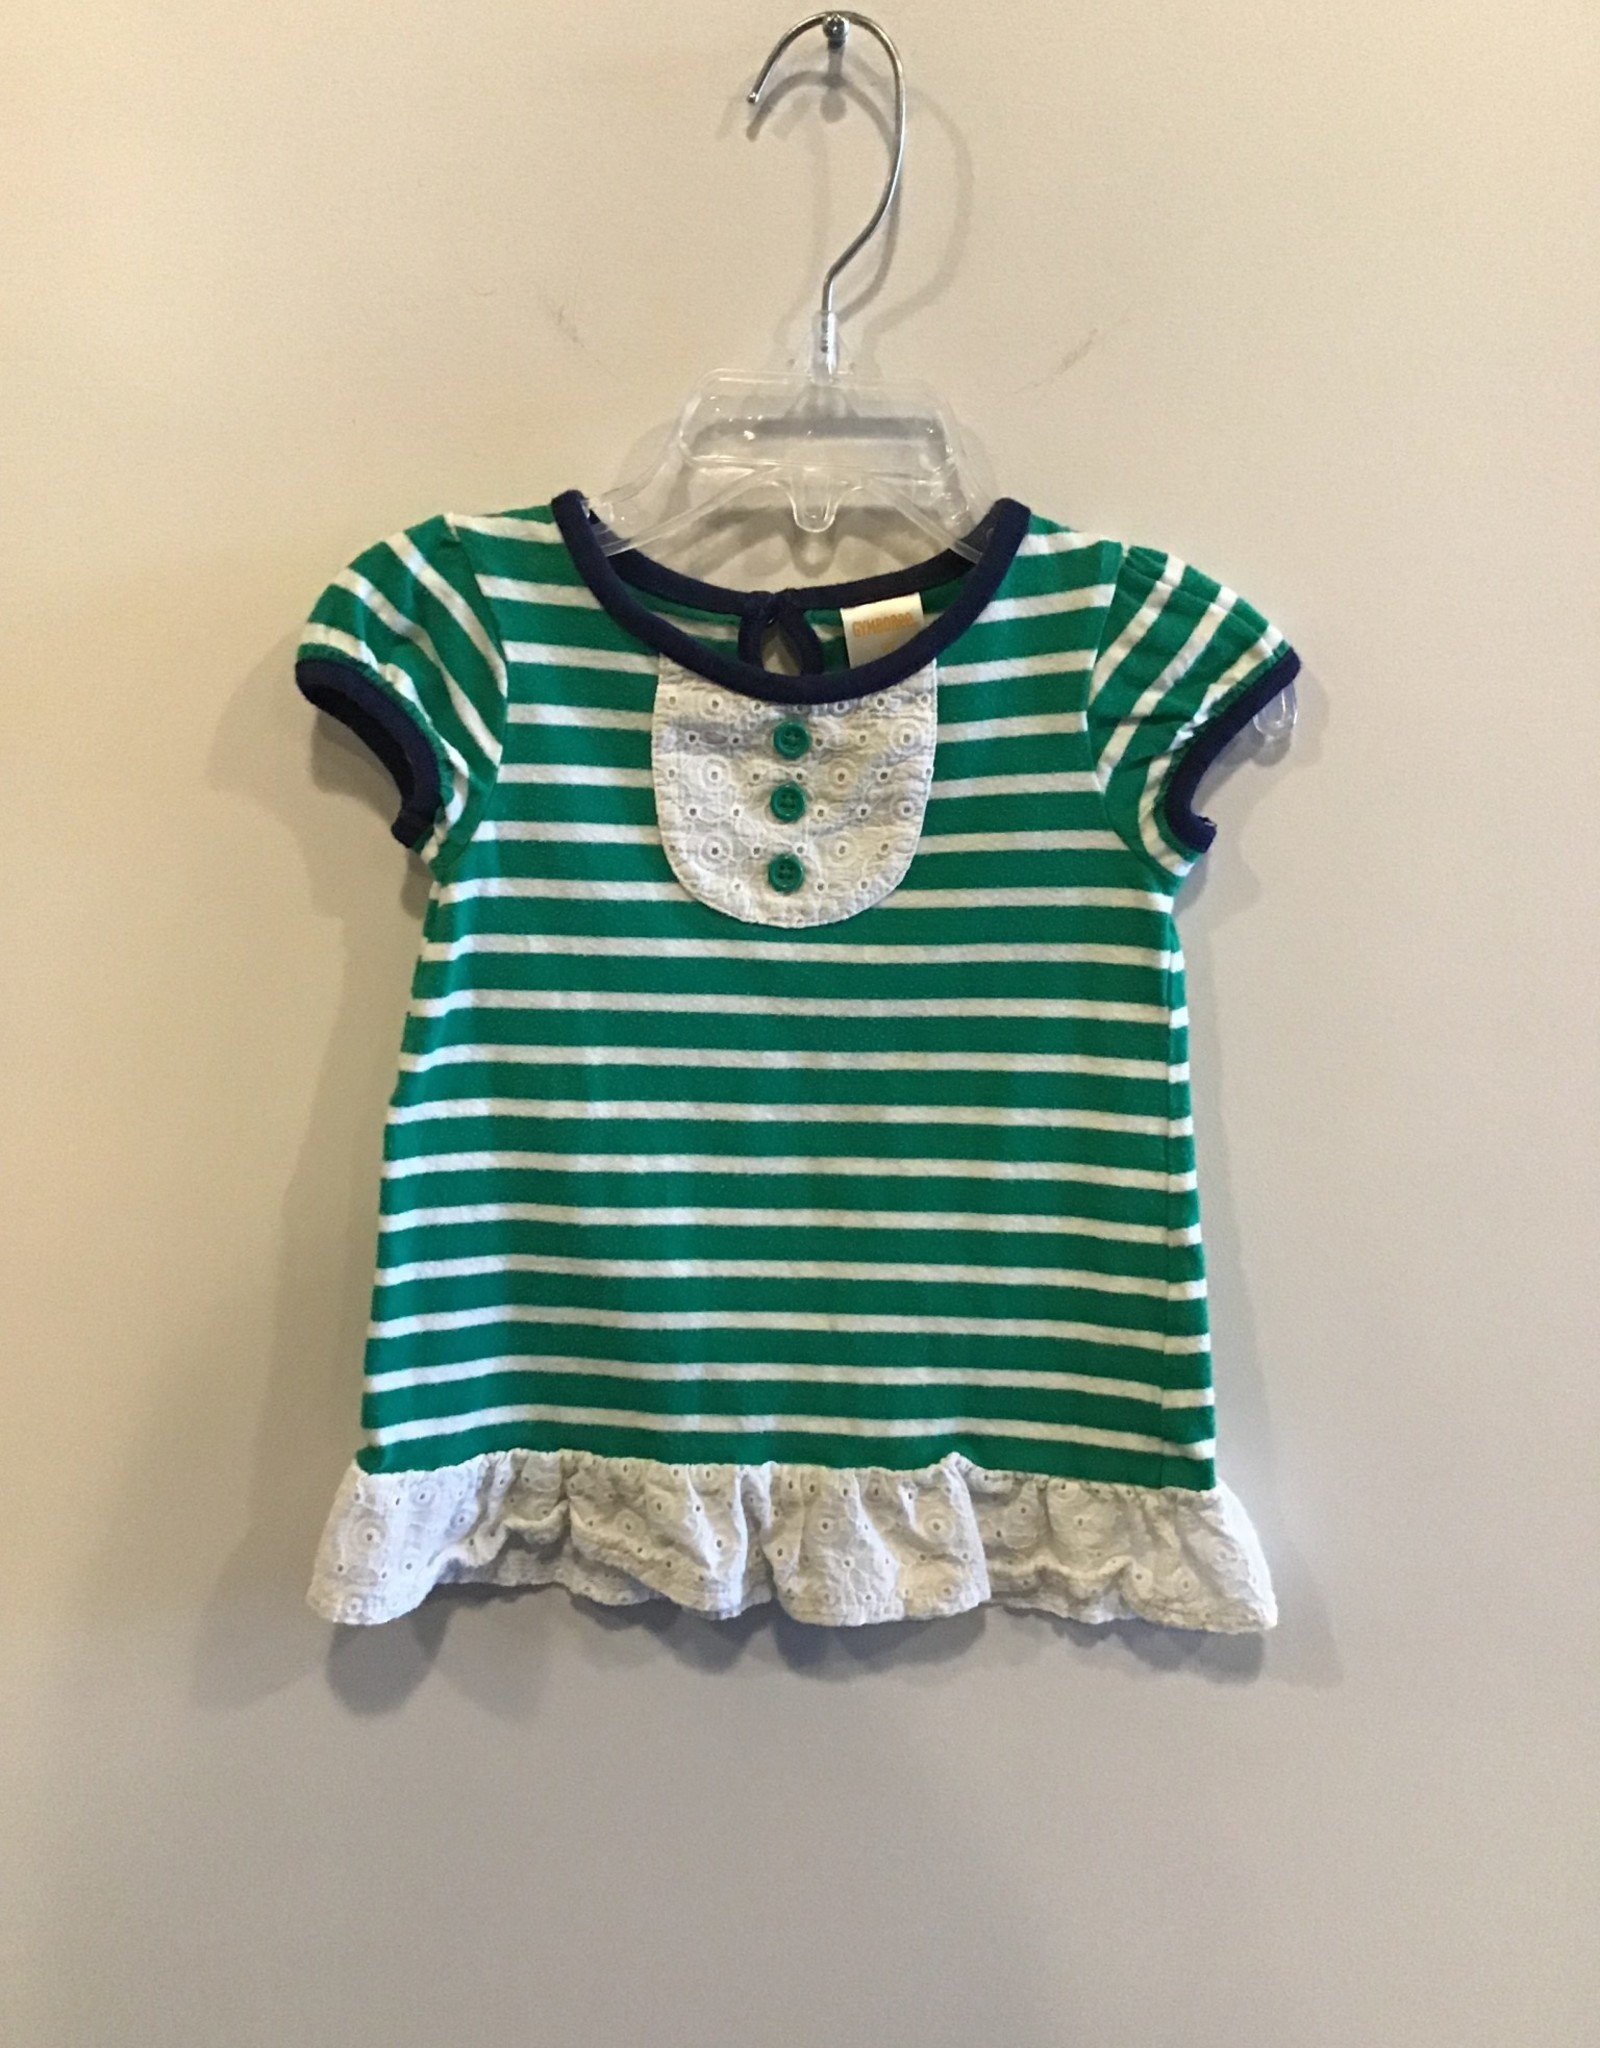 Gymboree Girls/2T/Gymboree/Shirt